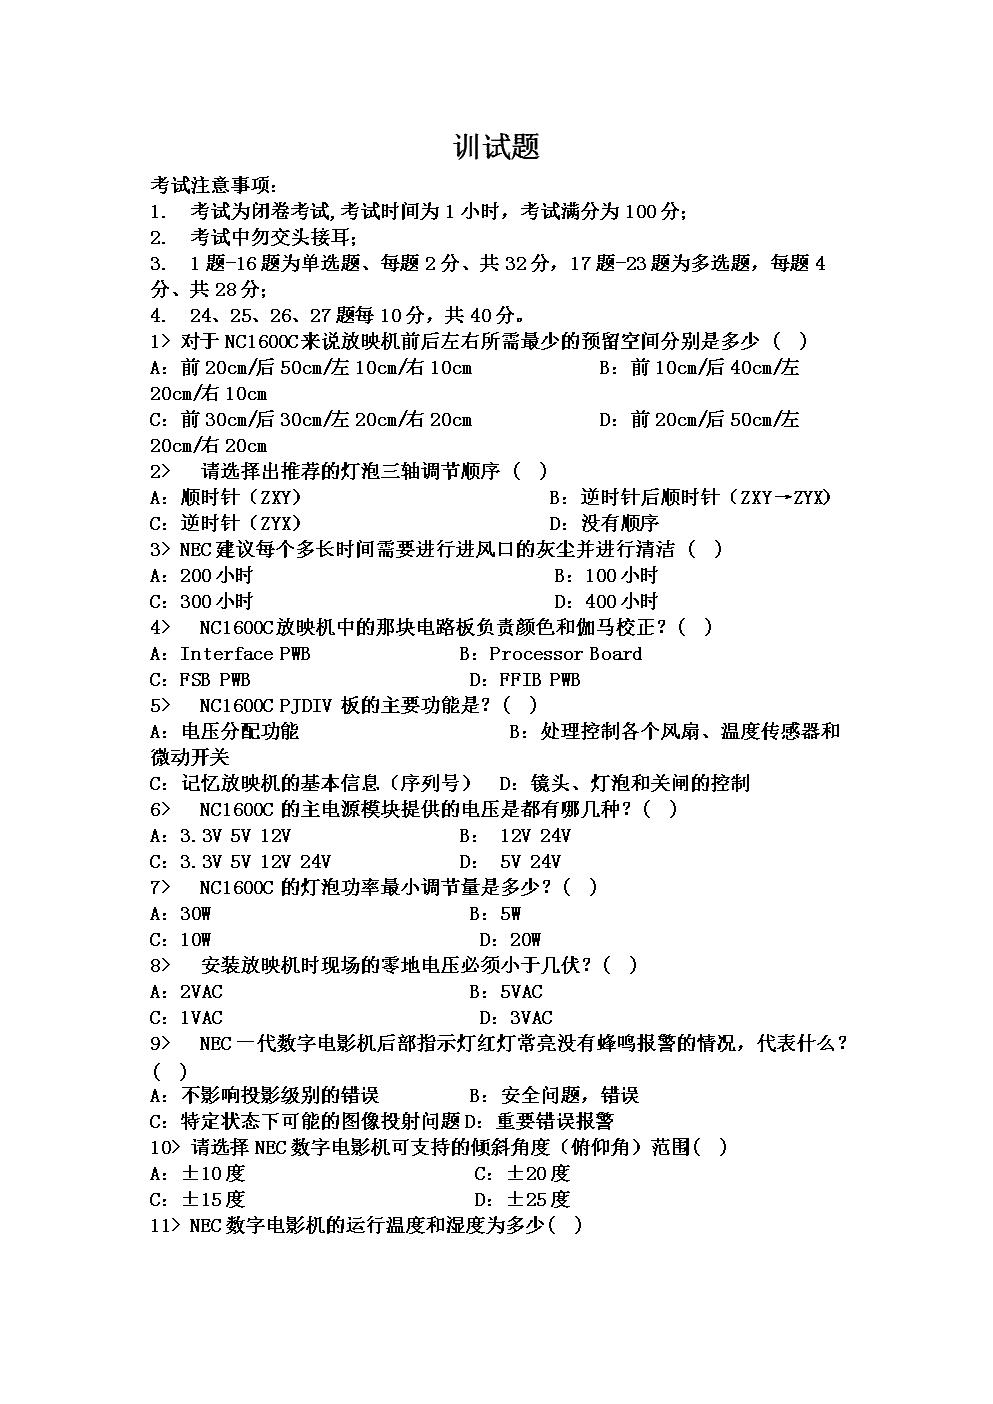 NEC电影机培训试题.doc